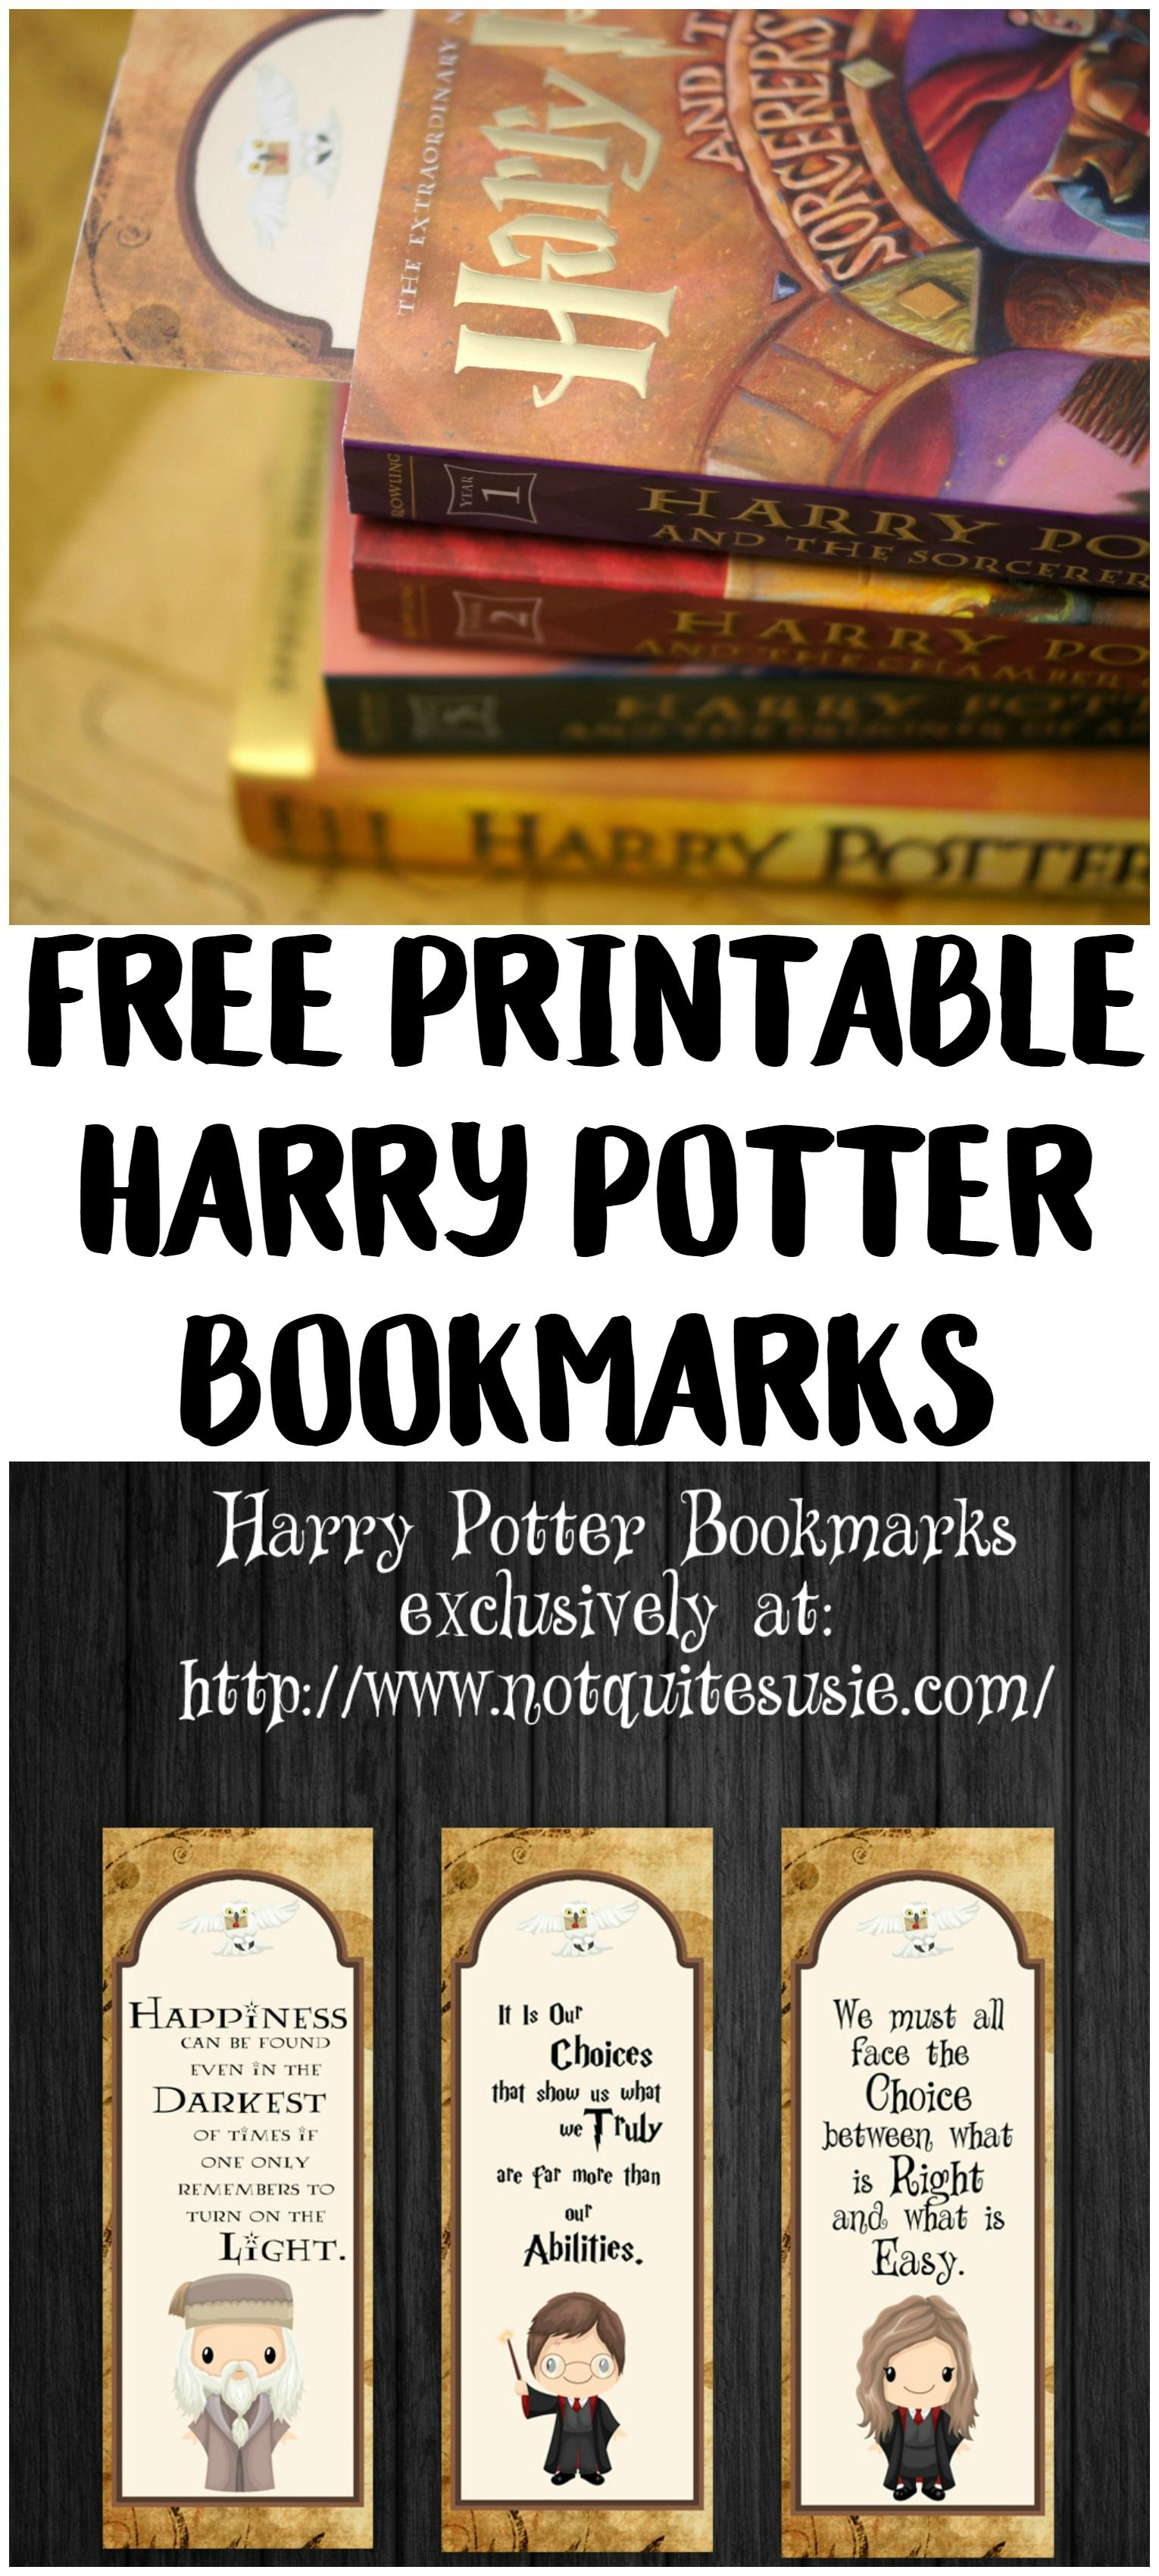 Free Printable Harry Potter Bookmarks | Geek Stuff | Pinterest - Free Printable Harry Potter Pictures